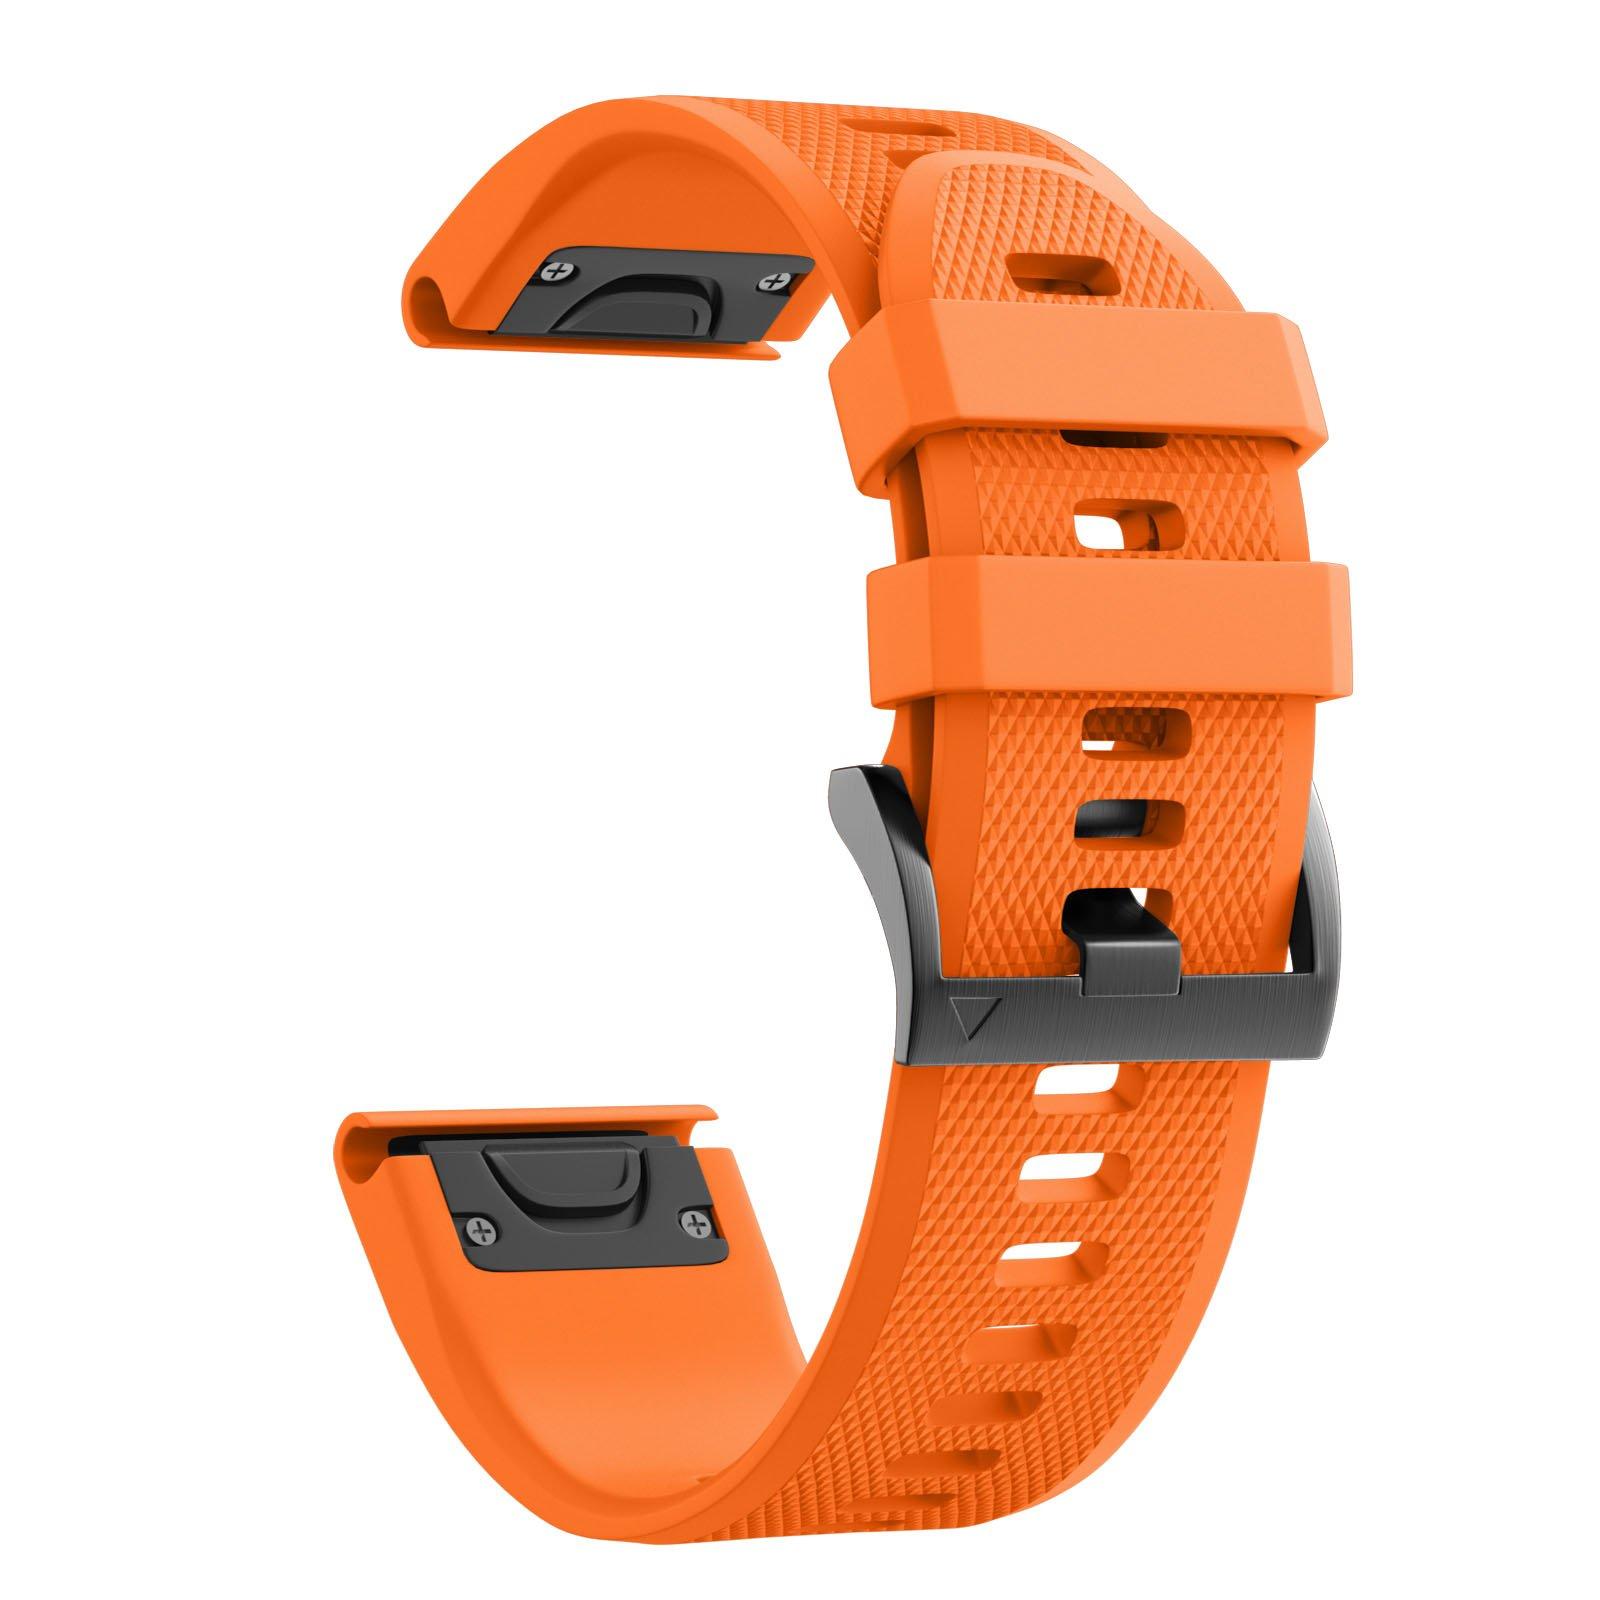 Notocity Compatible Fenix 5X Band 26mm Width Soft Silicone Watch Strap for Fenix 5X Plus/Fenix 6X/Fenix 6X Pro/Fenix 3/Fenix 3 HR/Descent MK1/D2 Delta PX/D2 Charlie-Orange by NotoCity